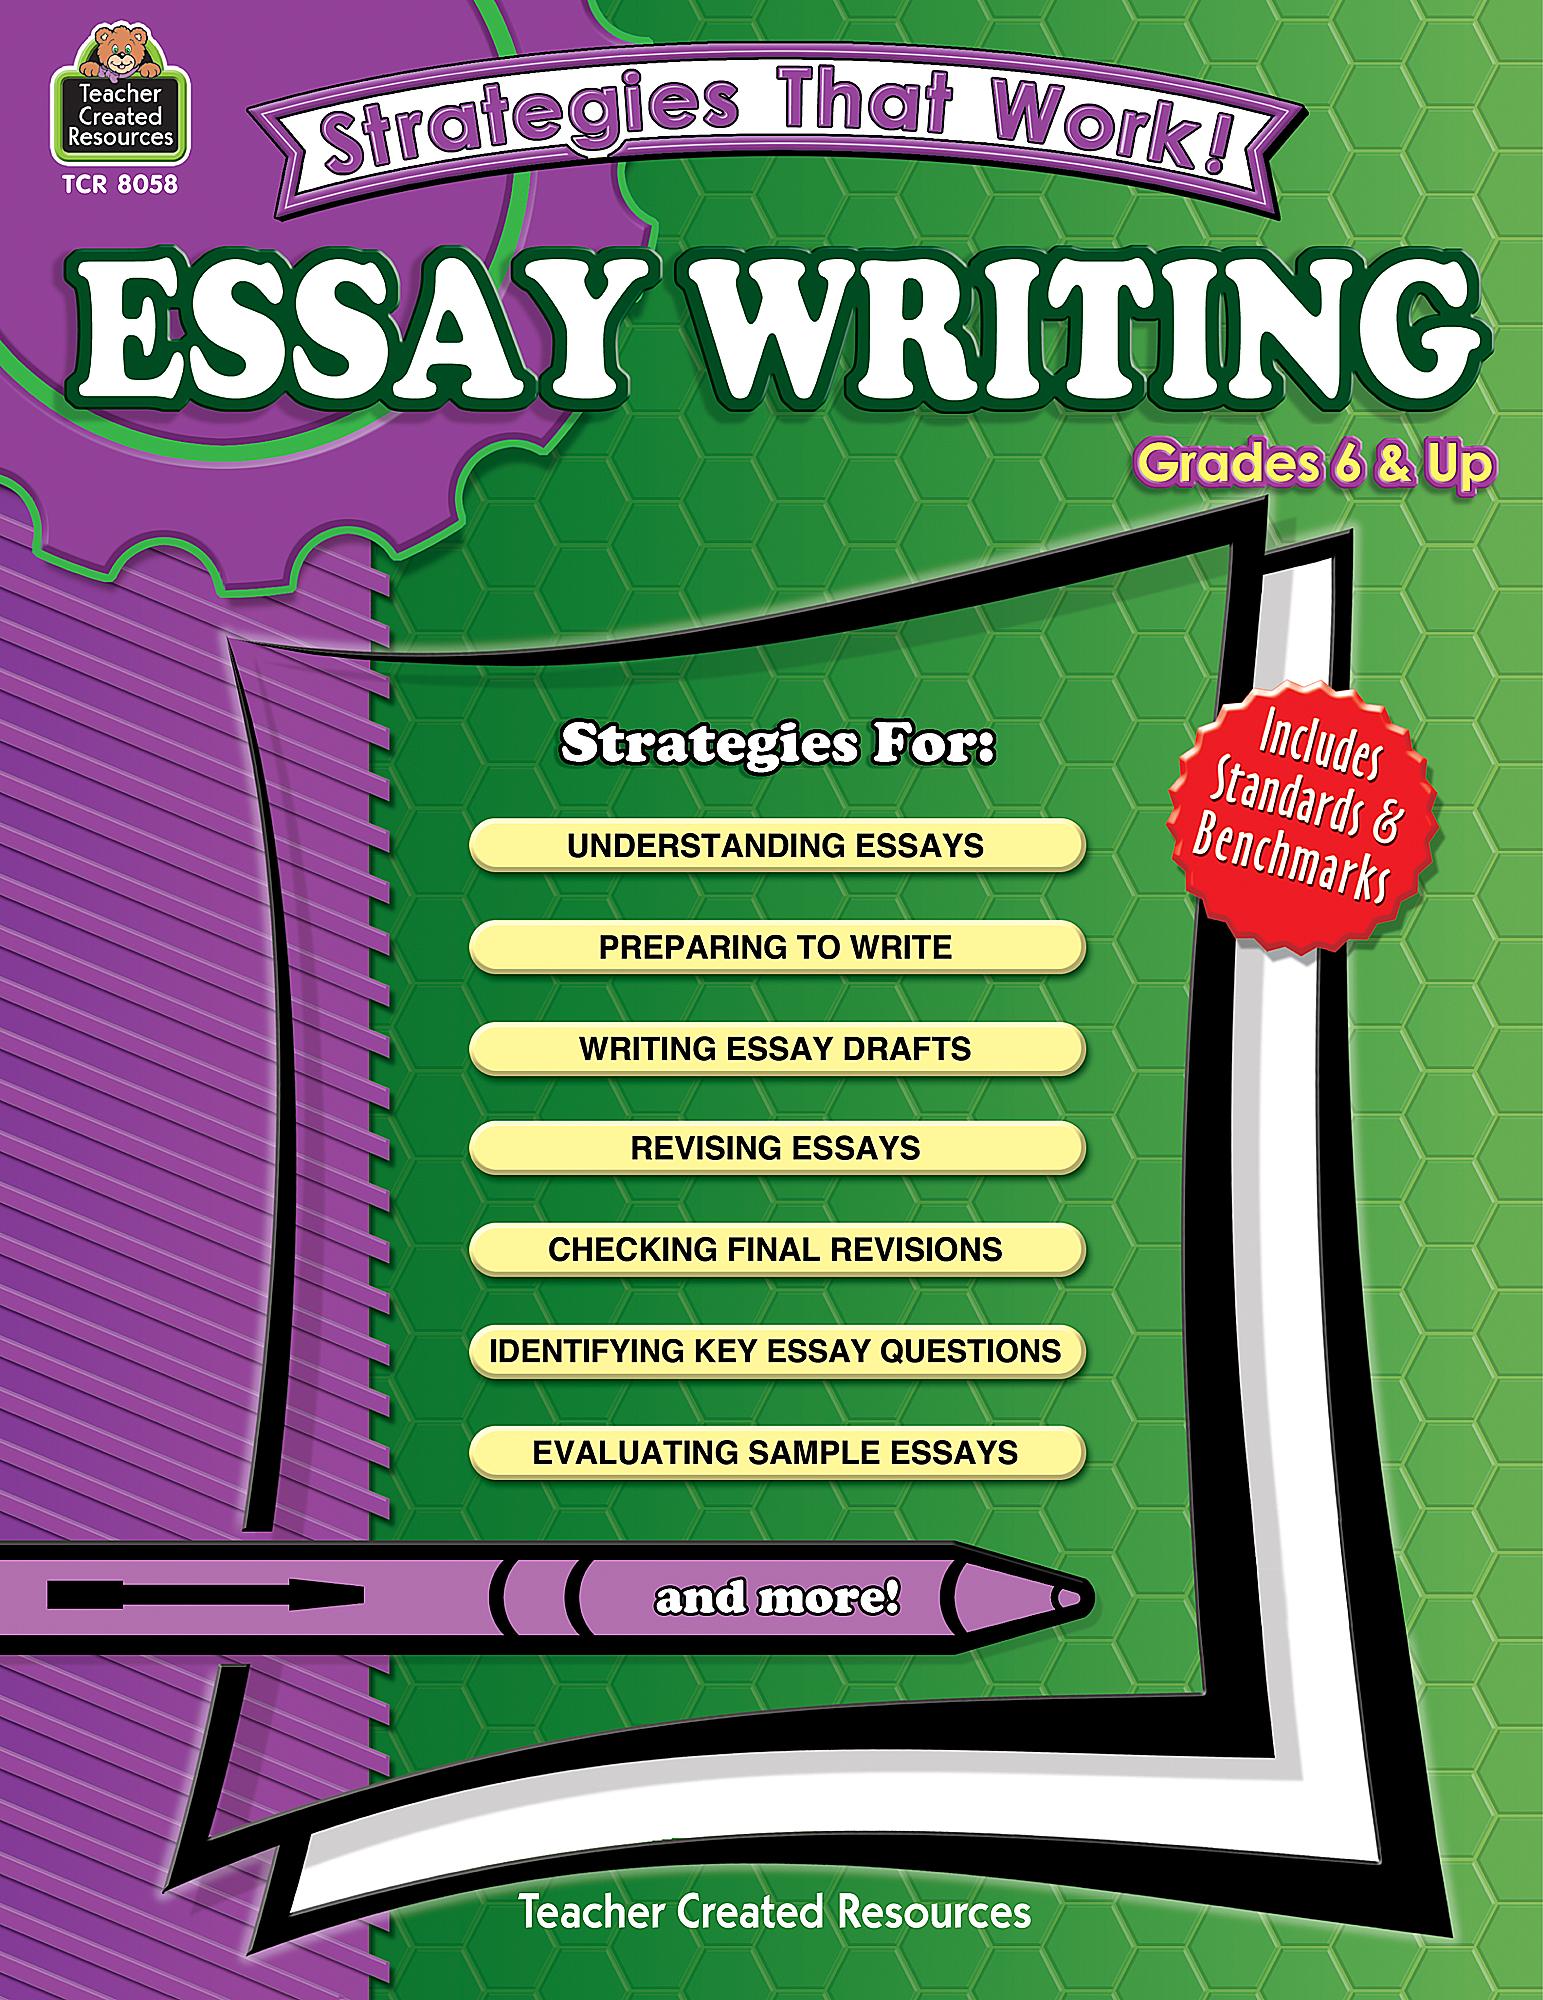 essay writing on teacher write better essays now essay editing kloehn anesthesis service wi